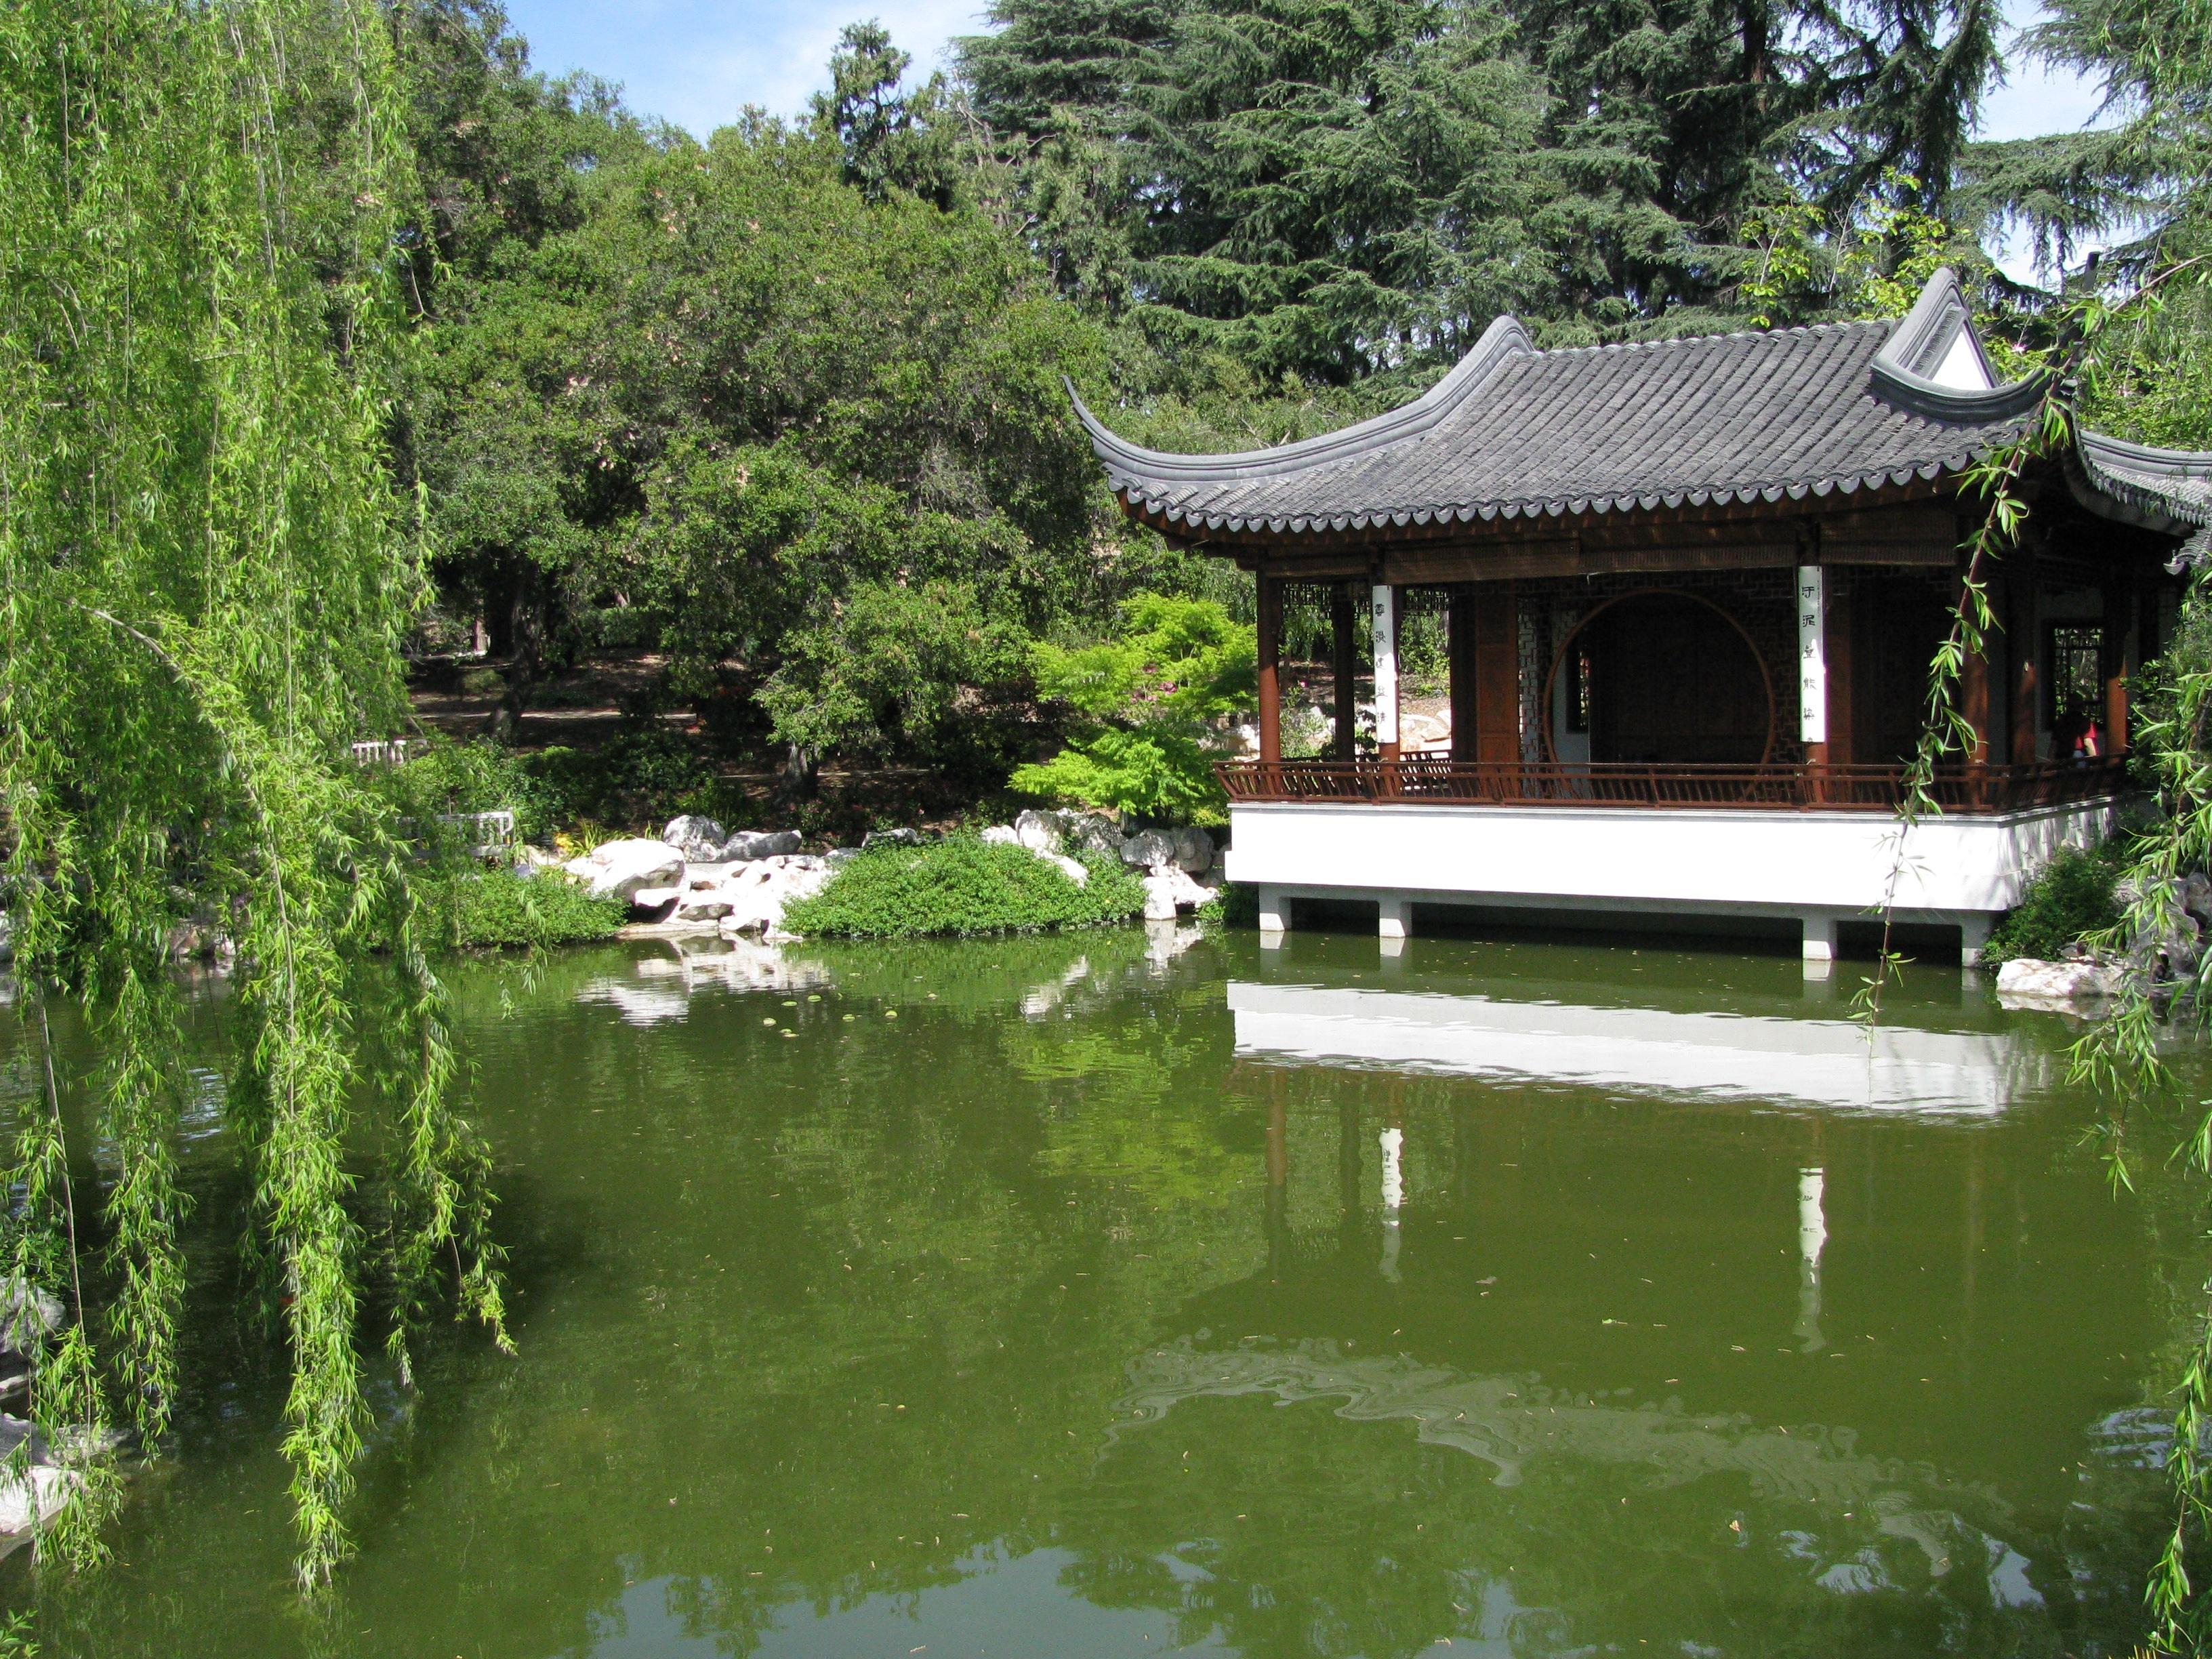 Giardino zen in casa realizzare un giardino bello - Giardino zen in casa ...